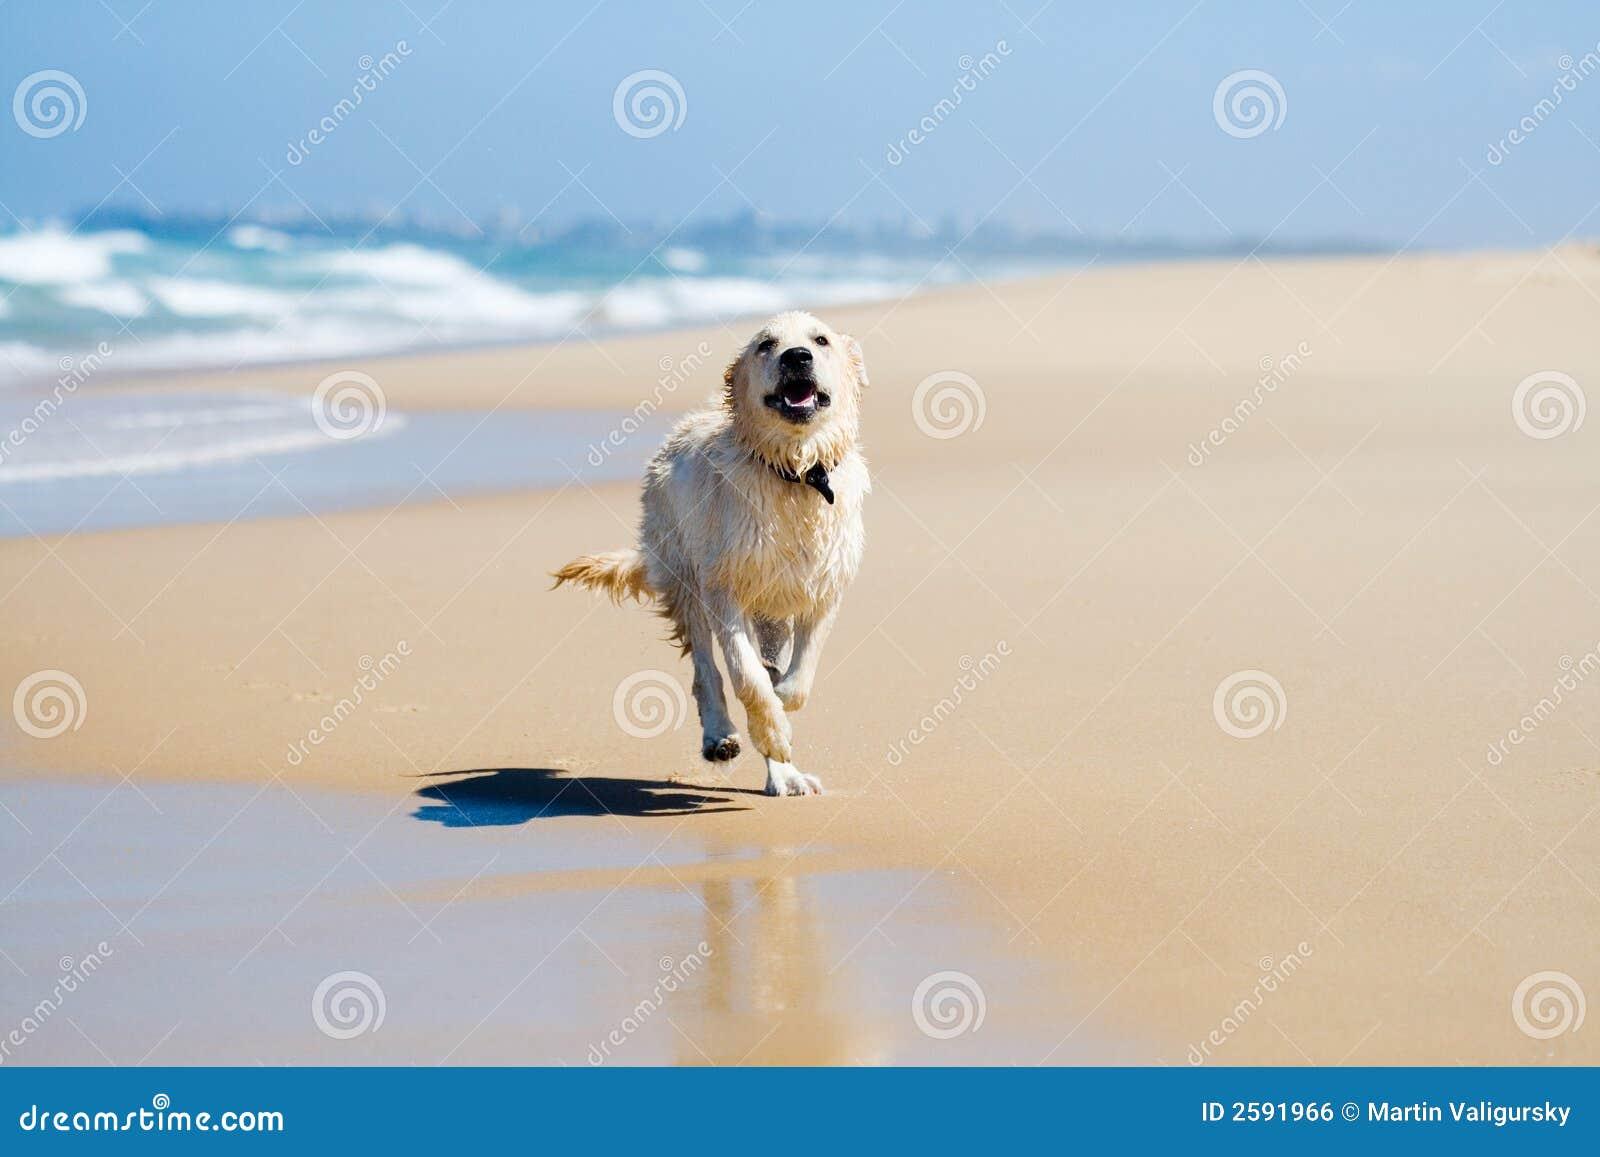 Dog running on a beach